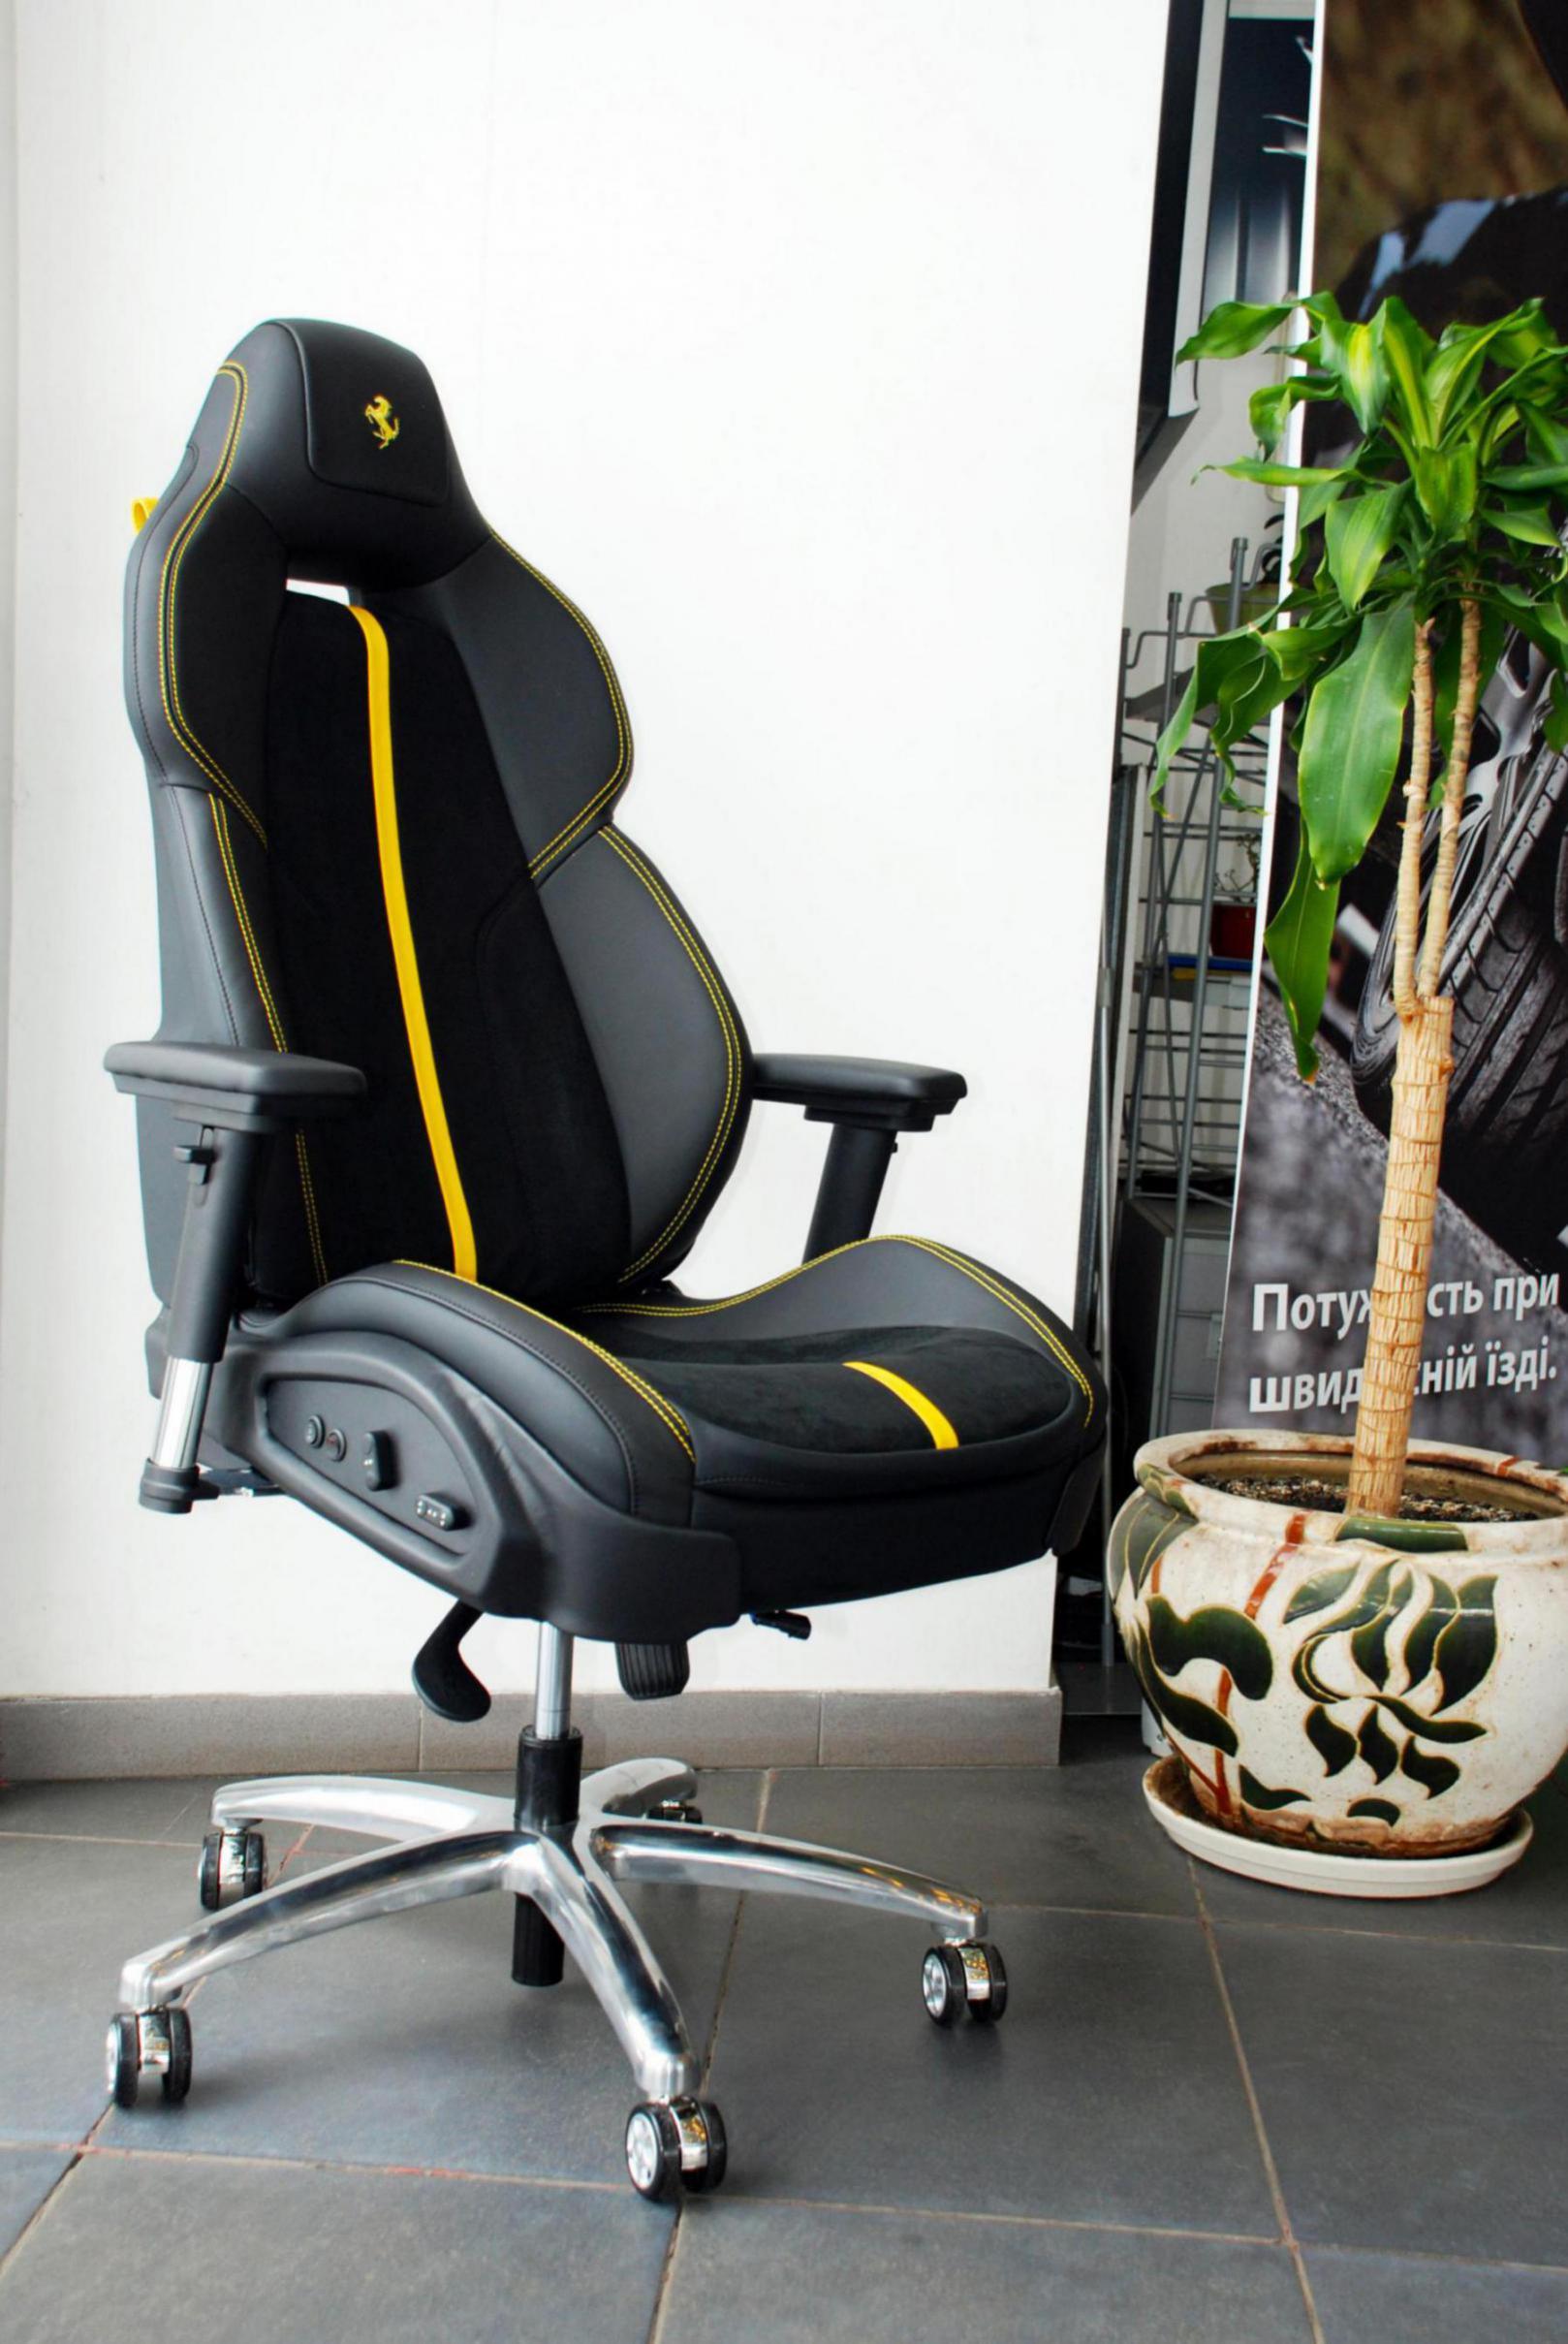 Office chair Ferrari California-dsc_3900_1522649238328.jpg